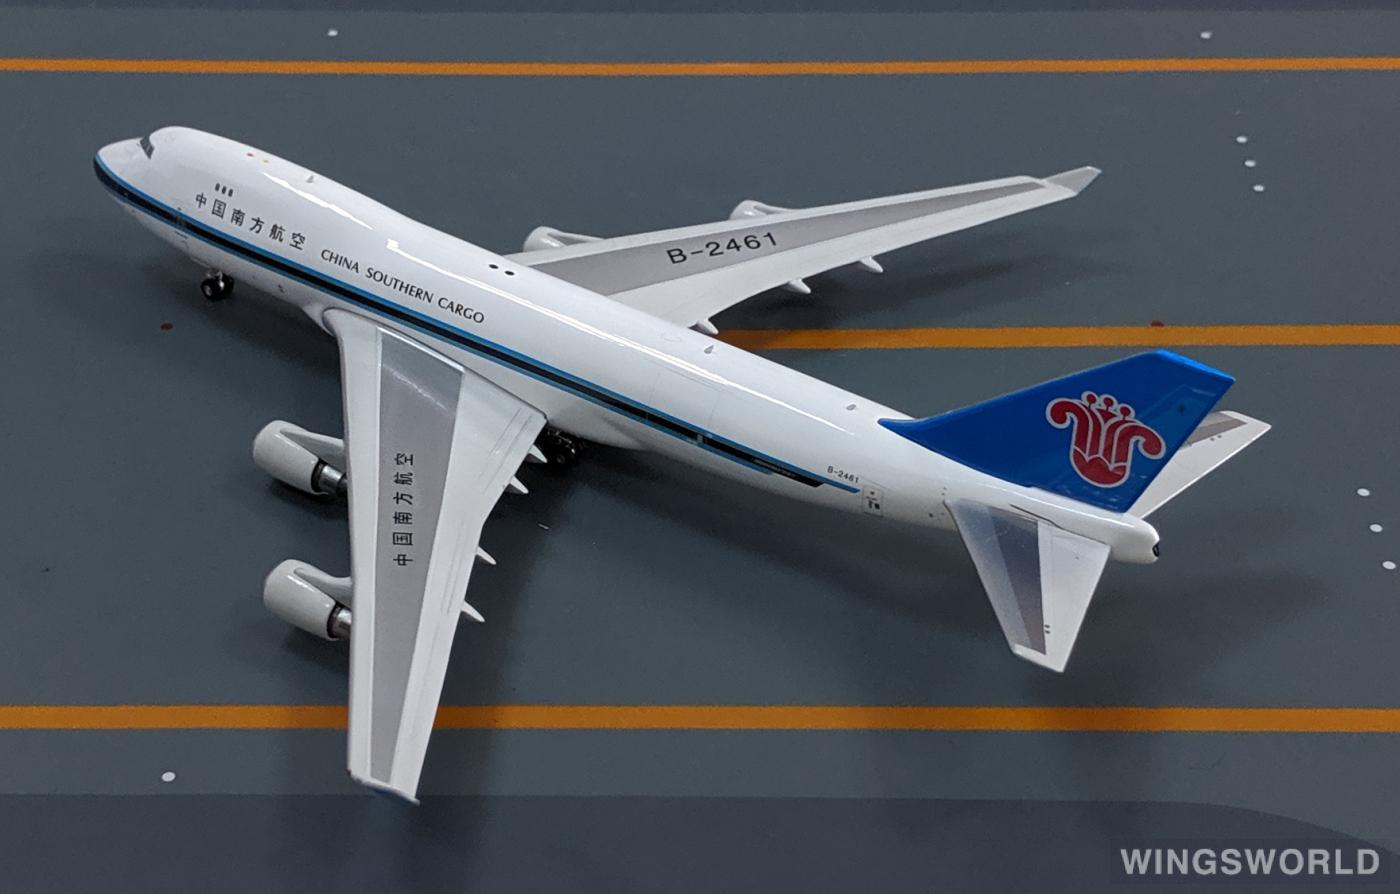 Phoenix 1:400 PH11368 China Southern 中国南方航空 Boeing 747-400 B-2461